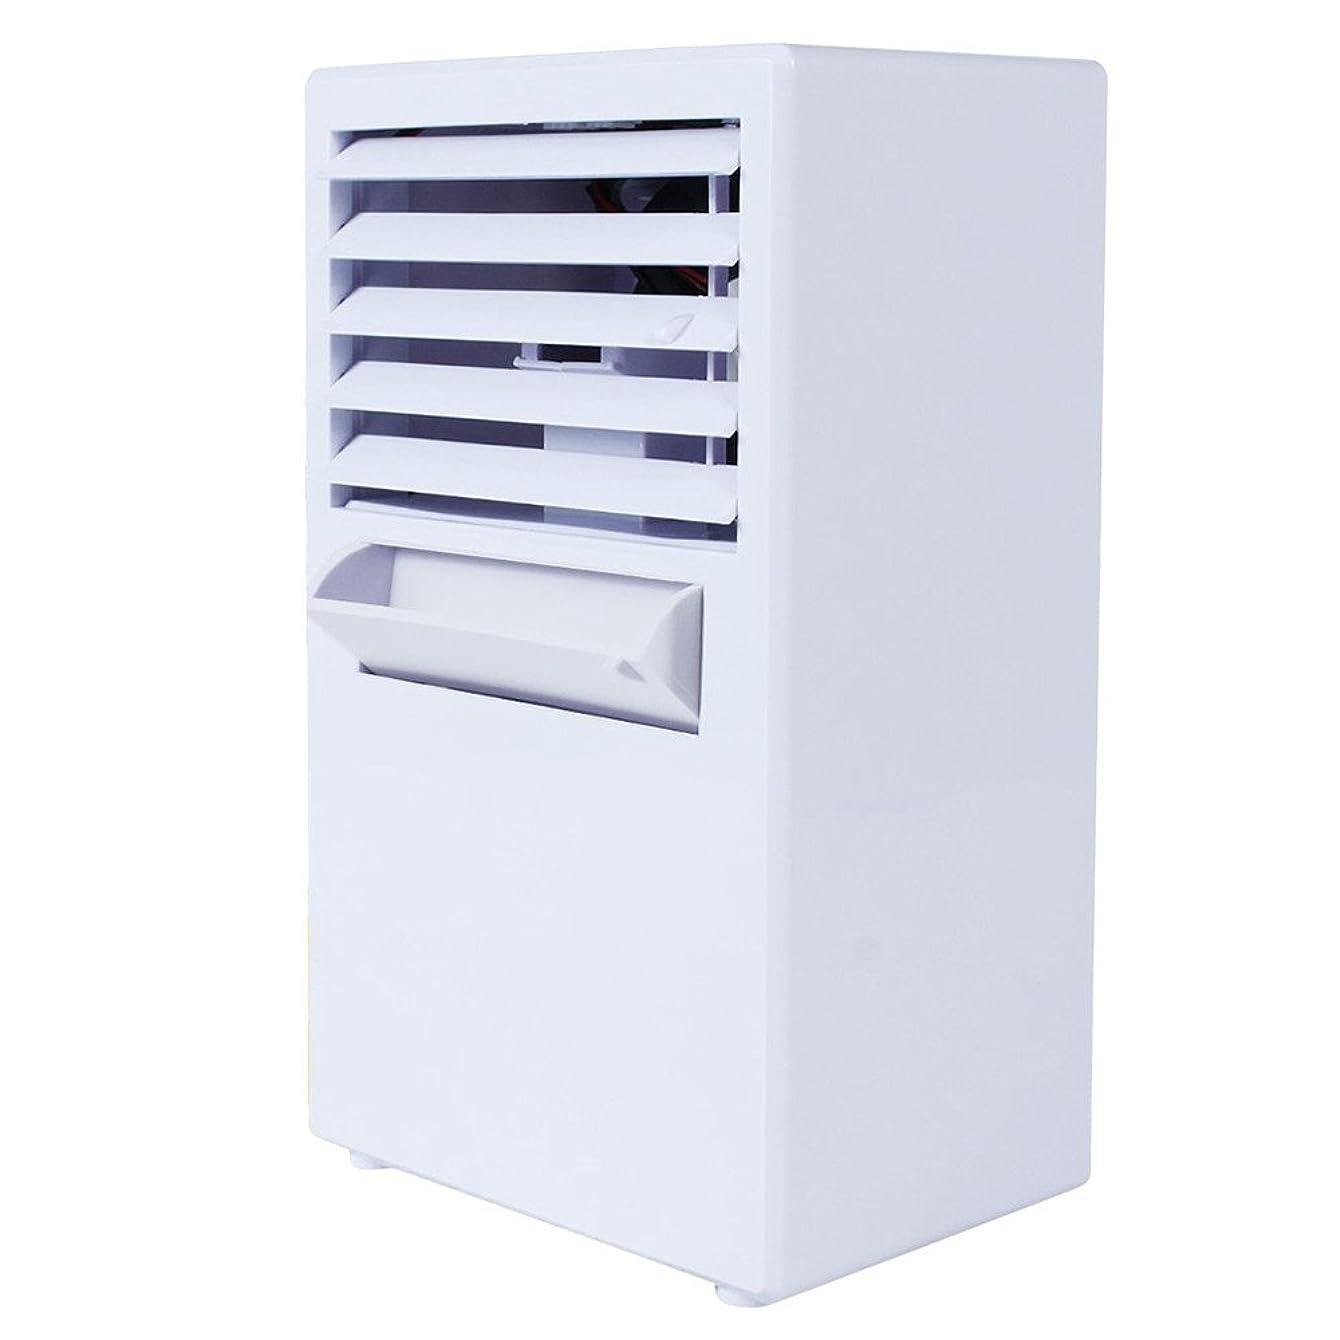 ?? Clothful, Portable Air Conditioner Fan Mini Evaporative Air Circulator Cooler Humidifier